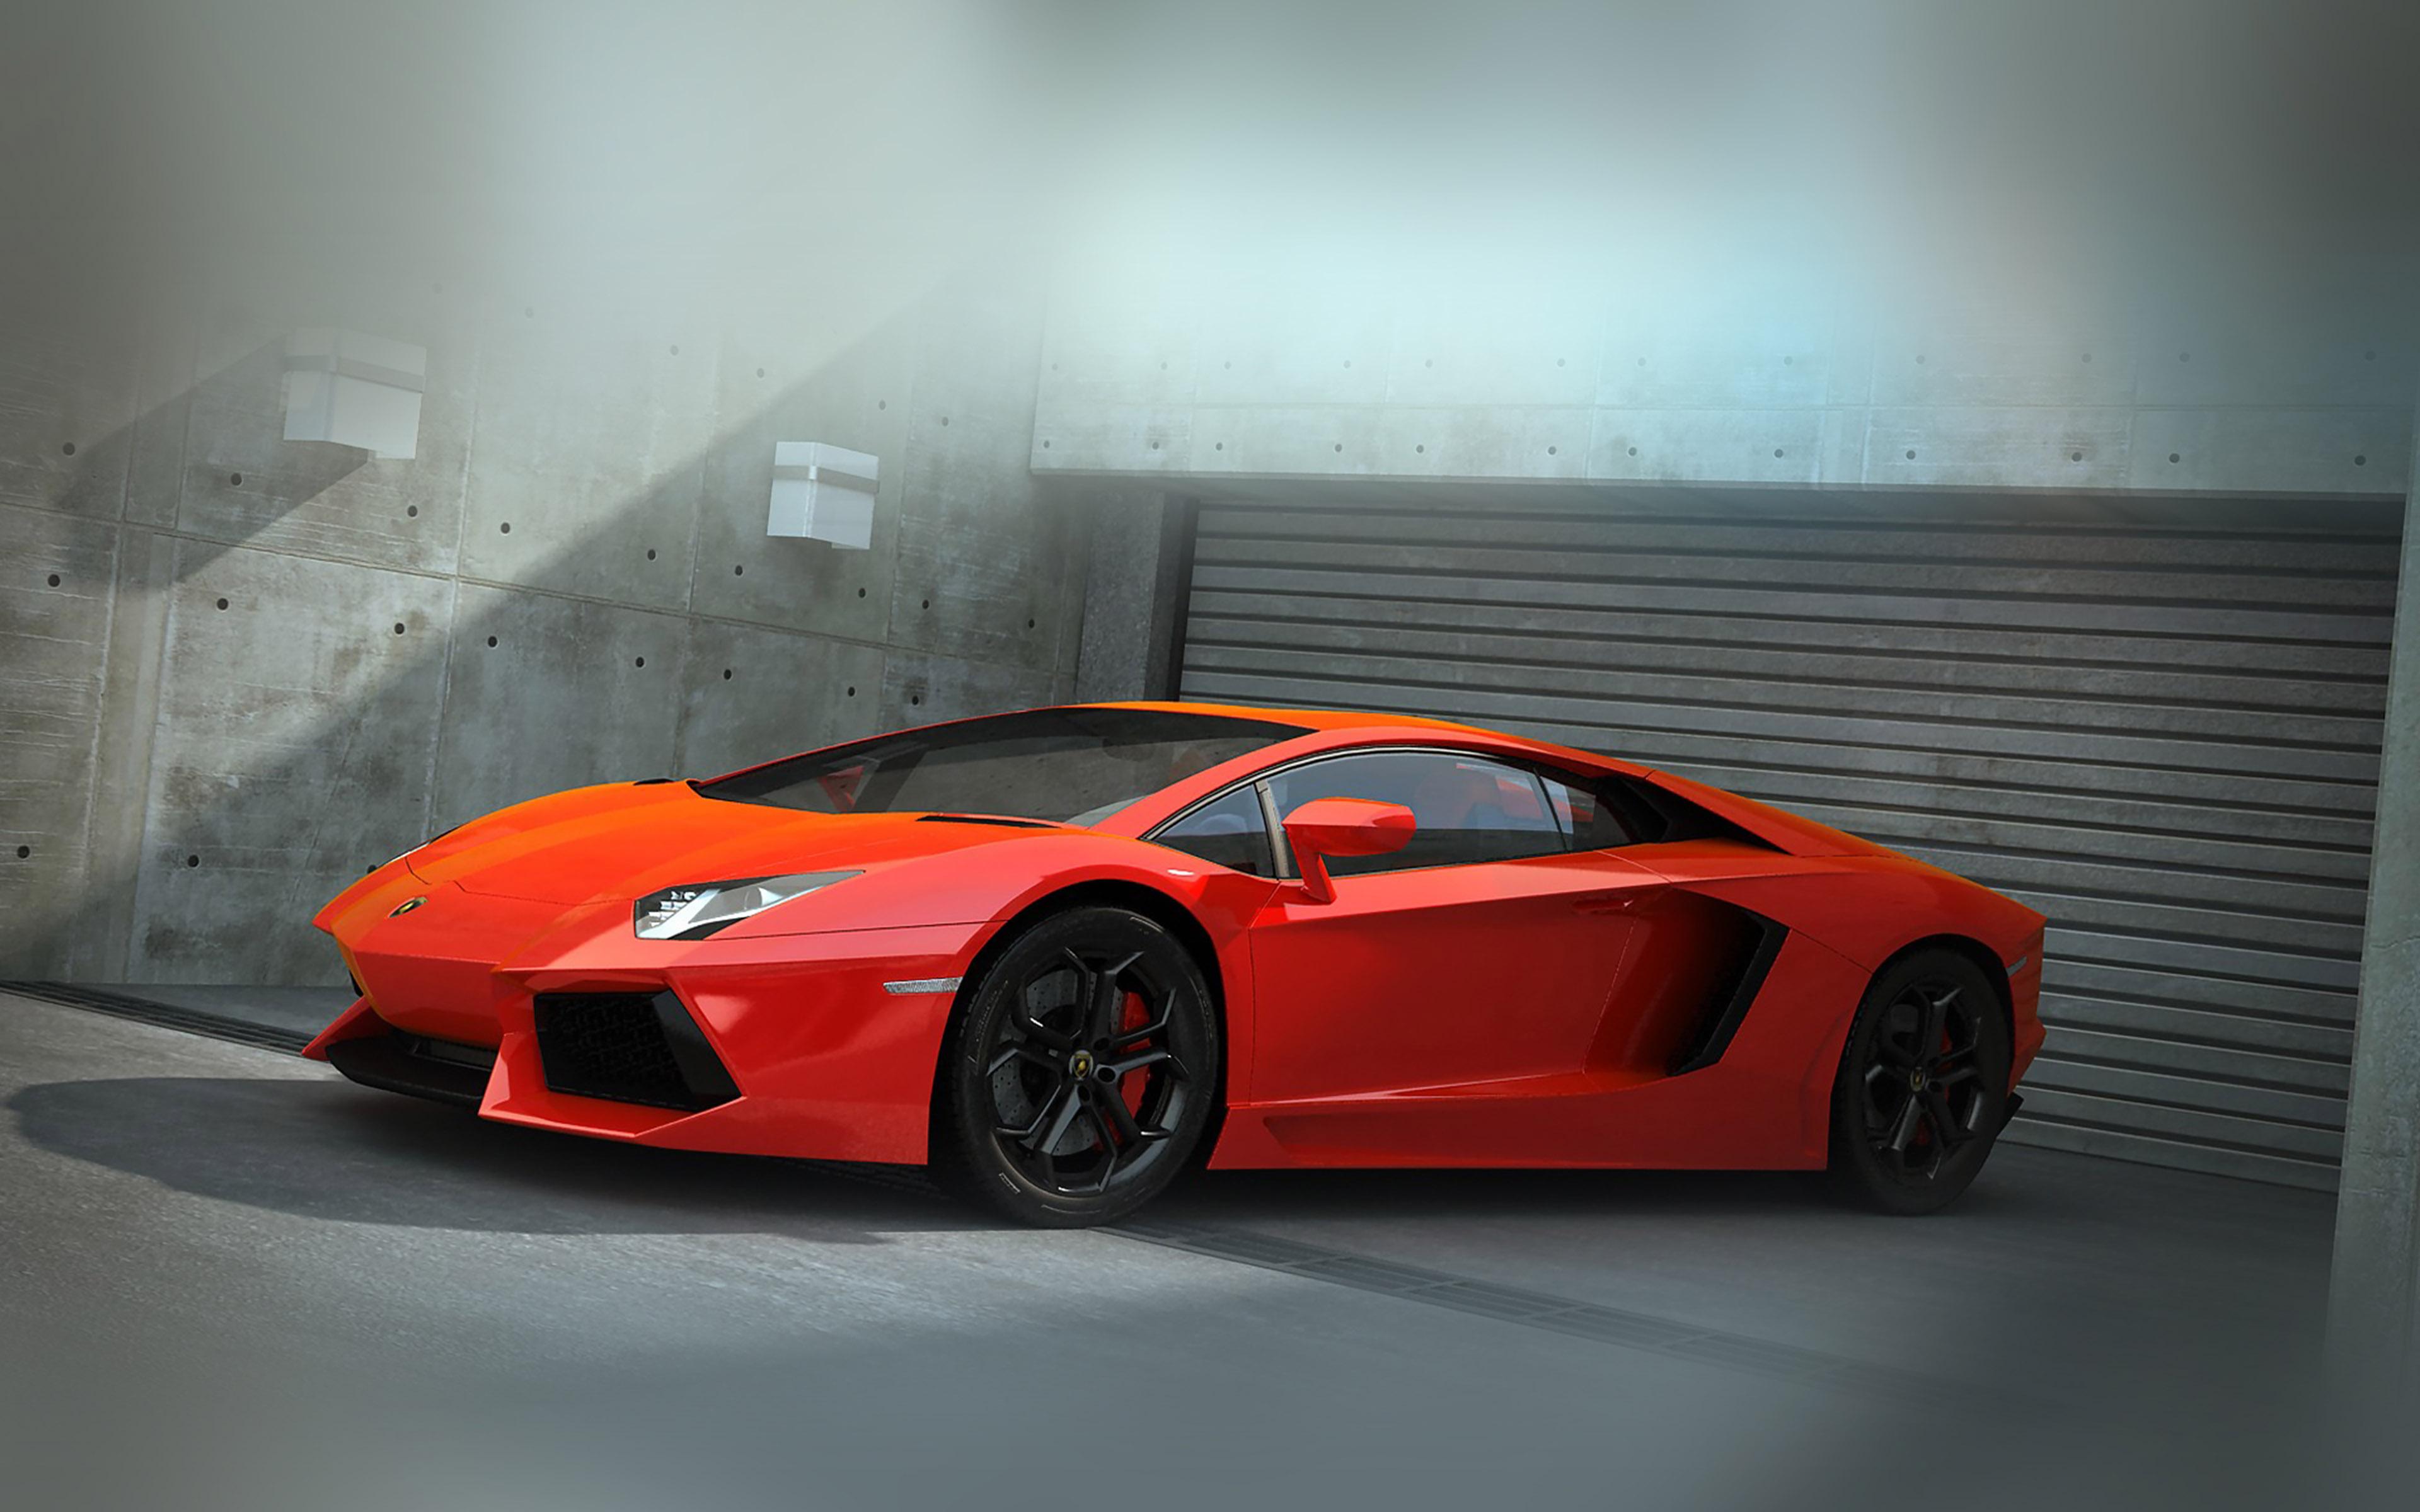 Ai89 Red Lamborghini Parked Car Art Papers Co